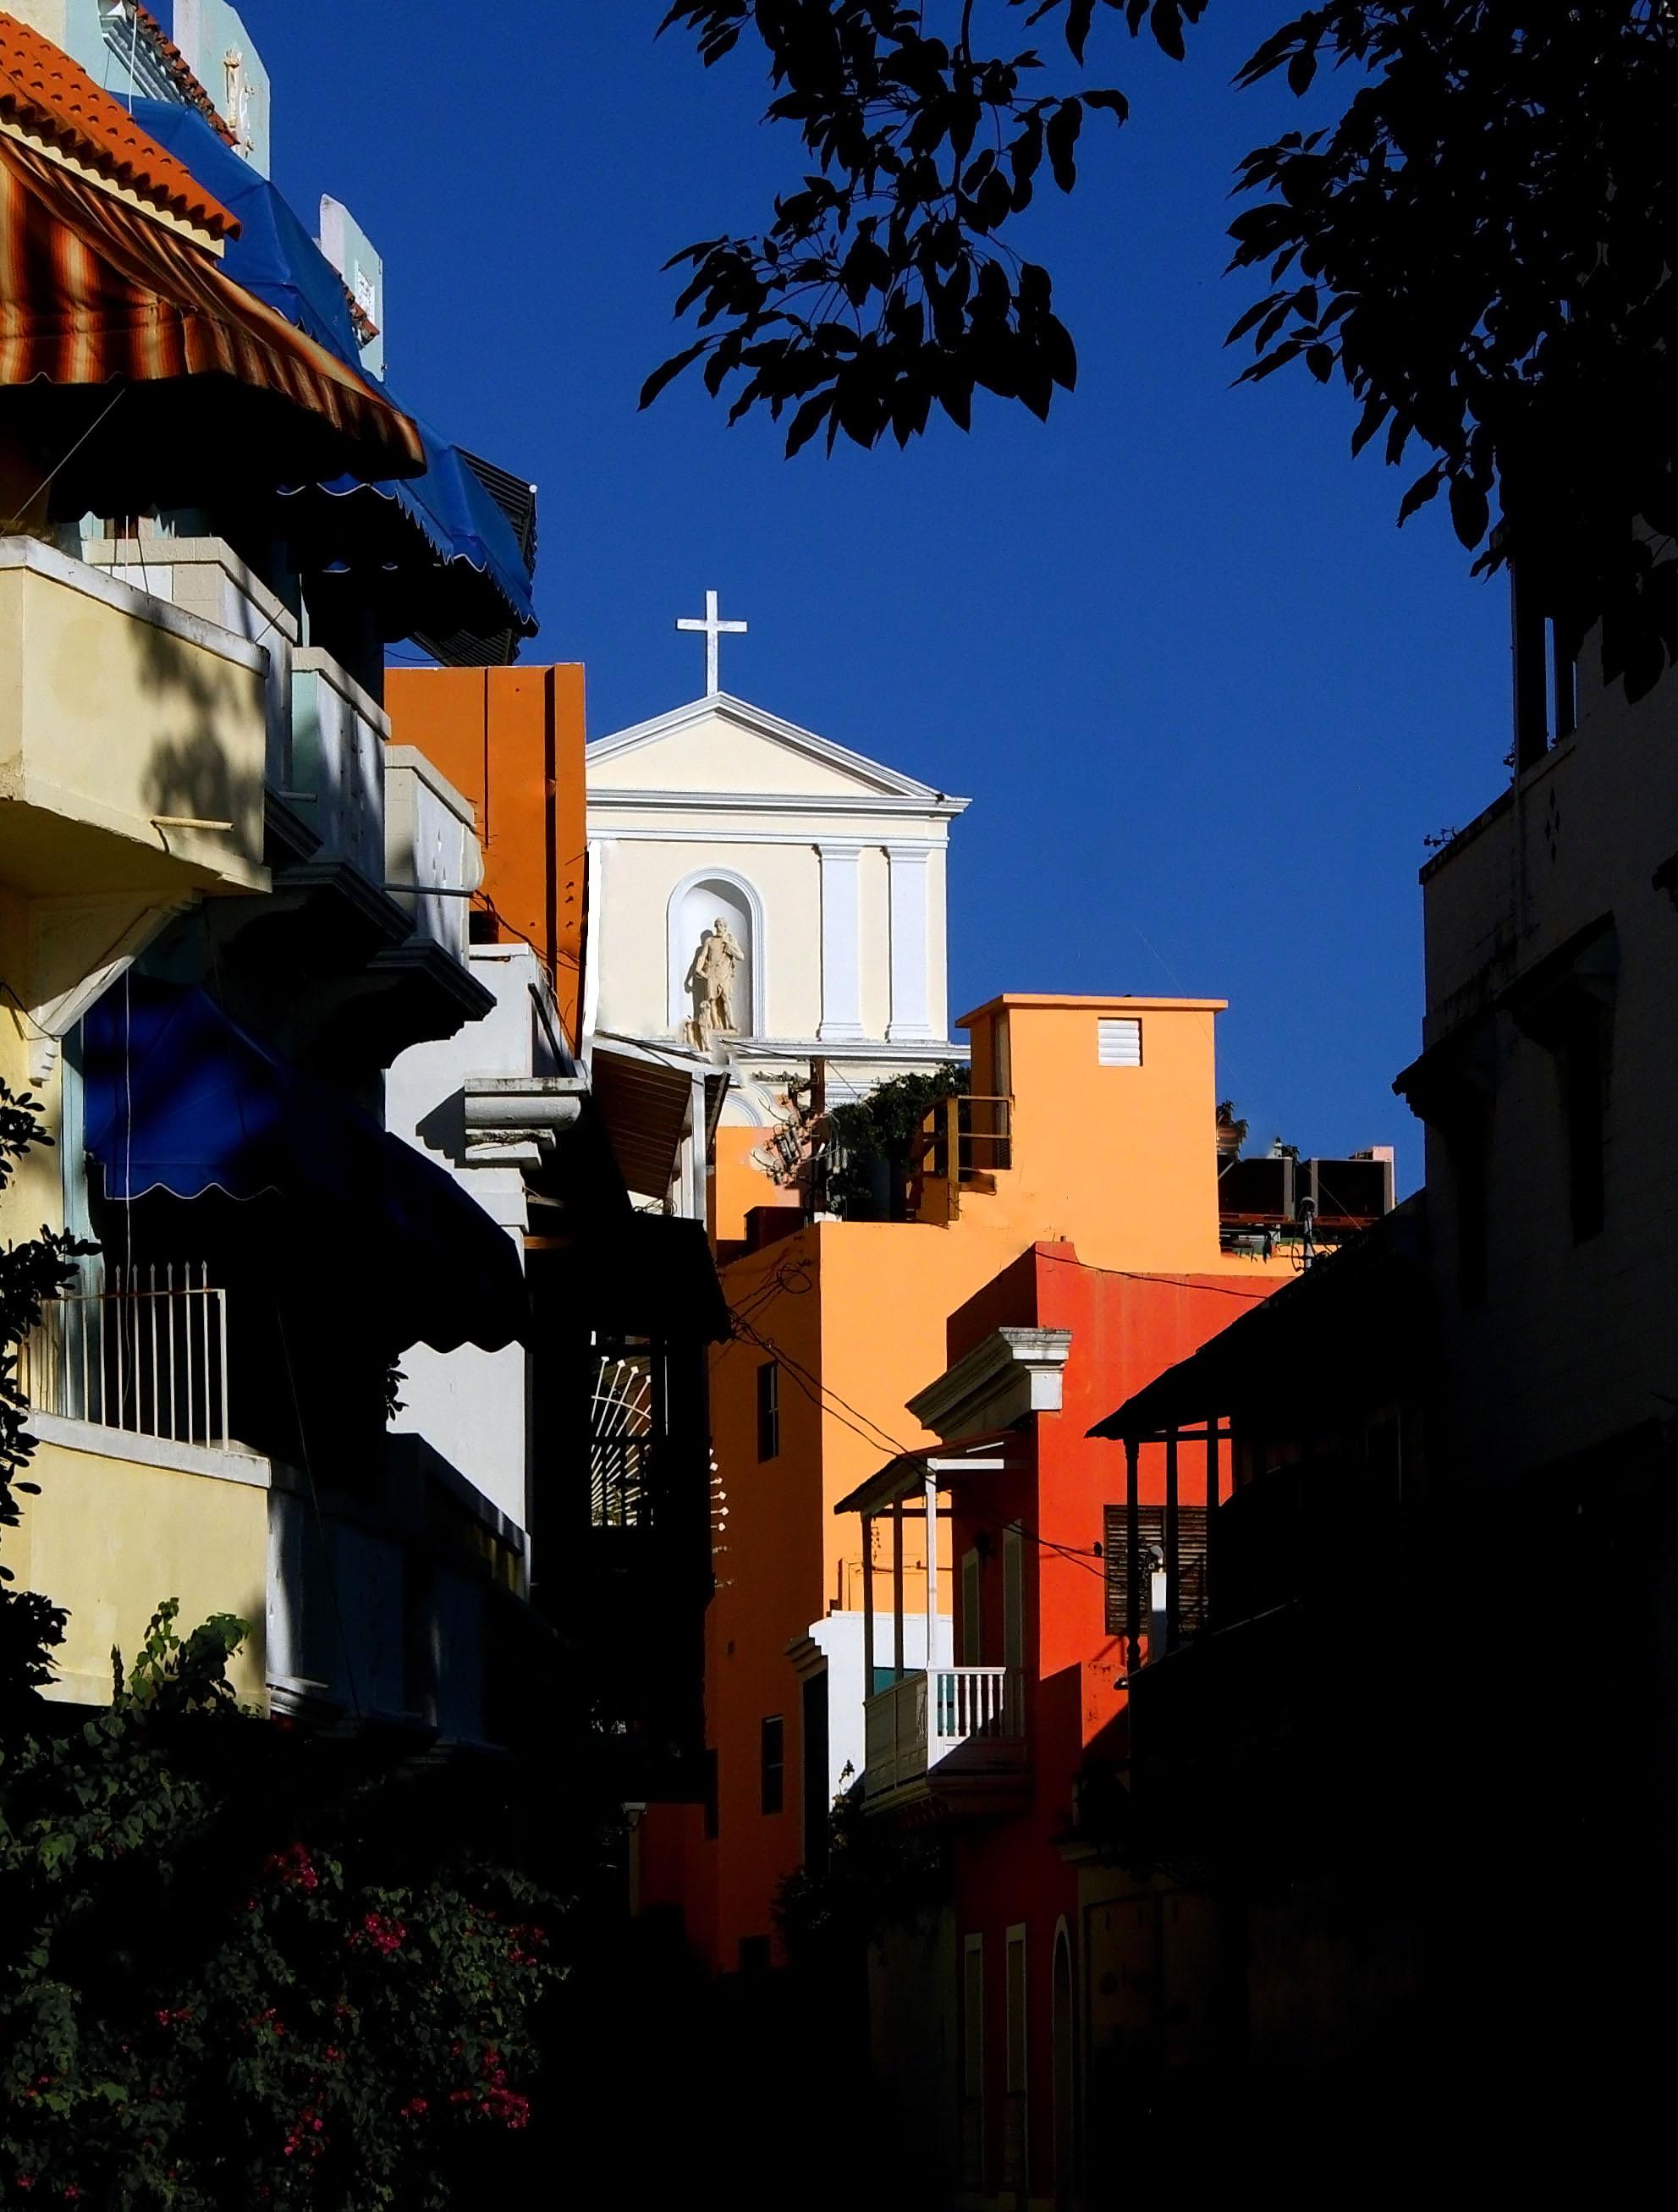 Caleta de las monjas / Old San Juan